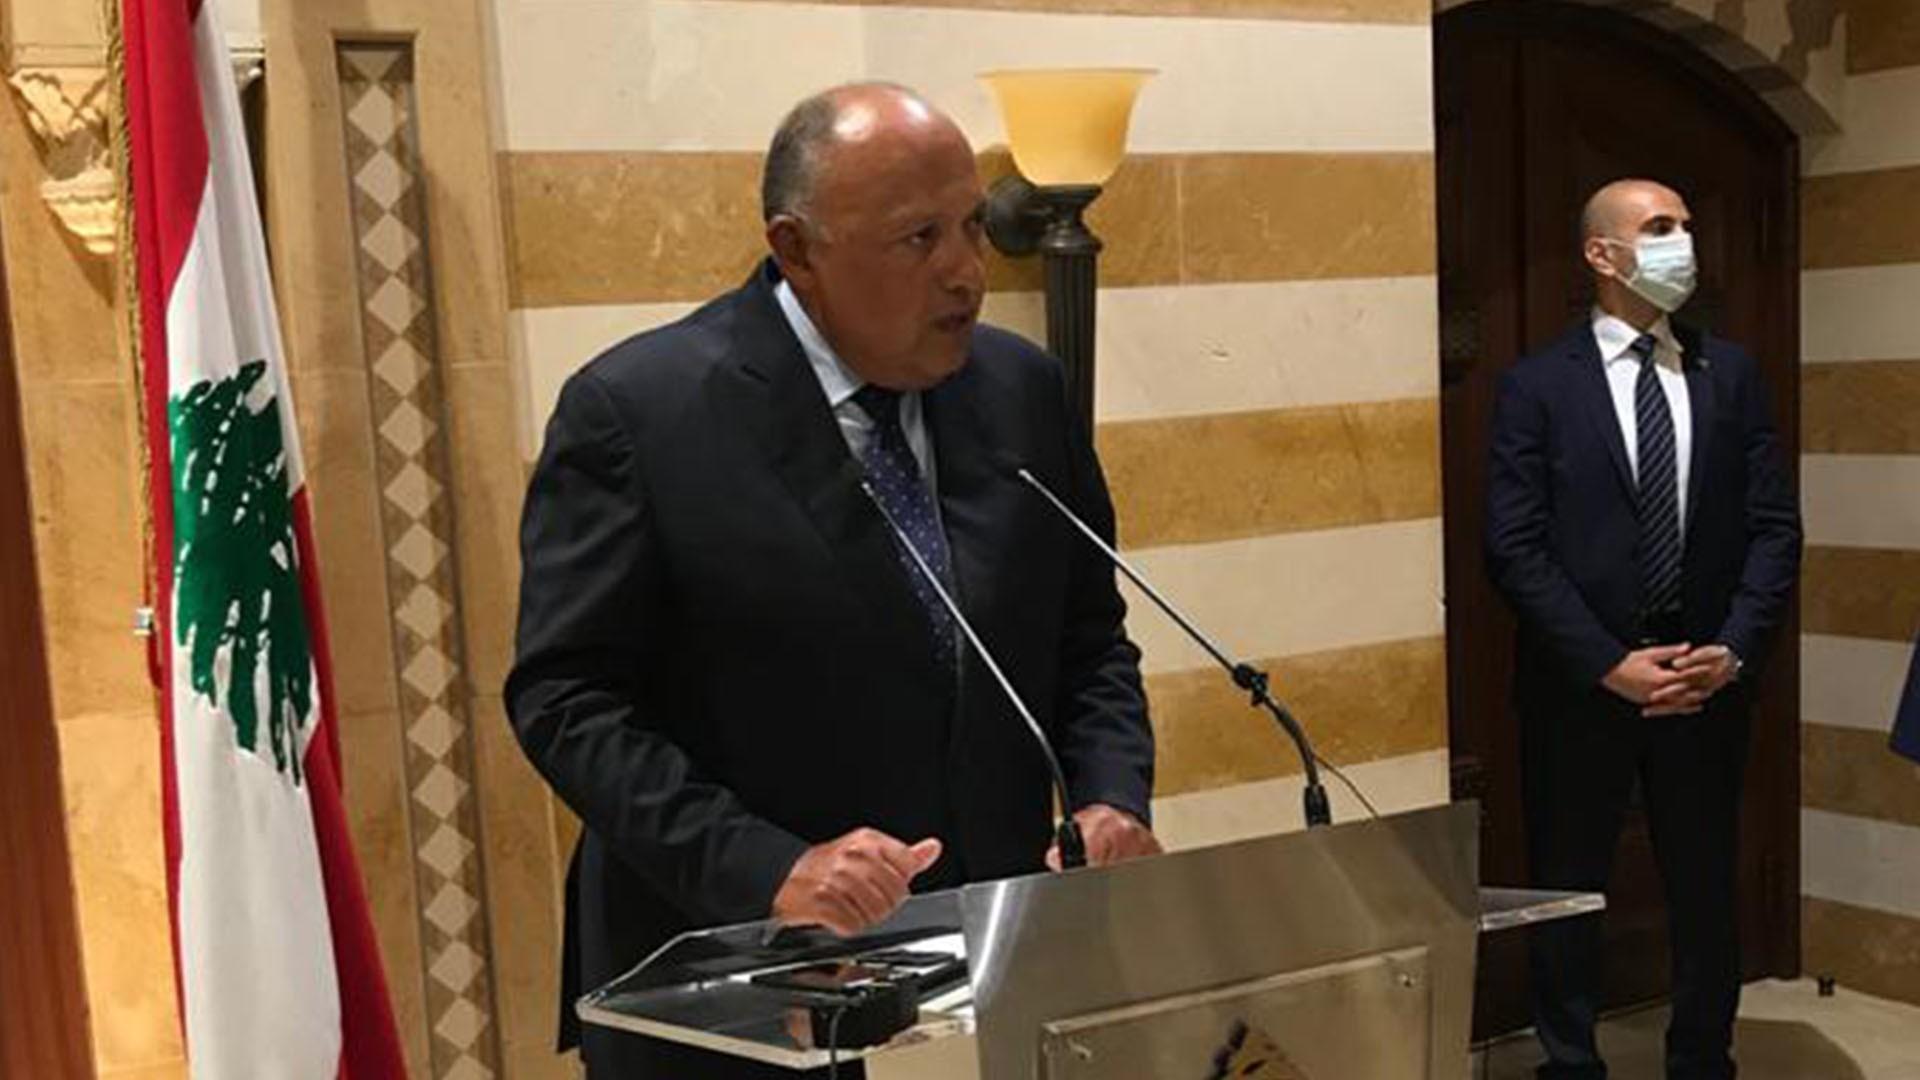 دعم مصري للبنان عقب انفجار بيروت